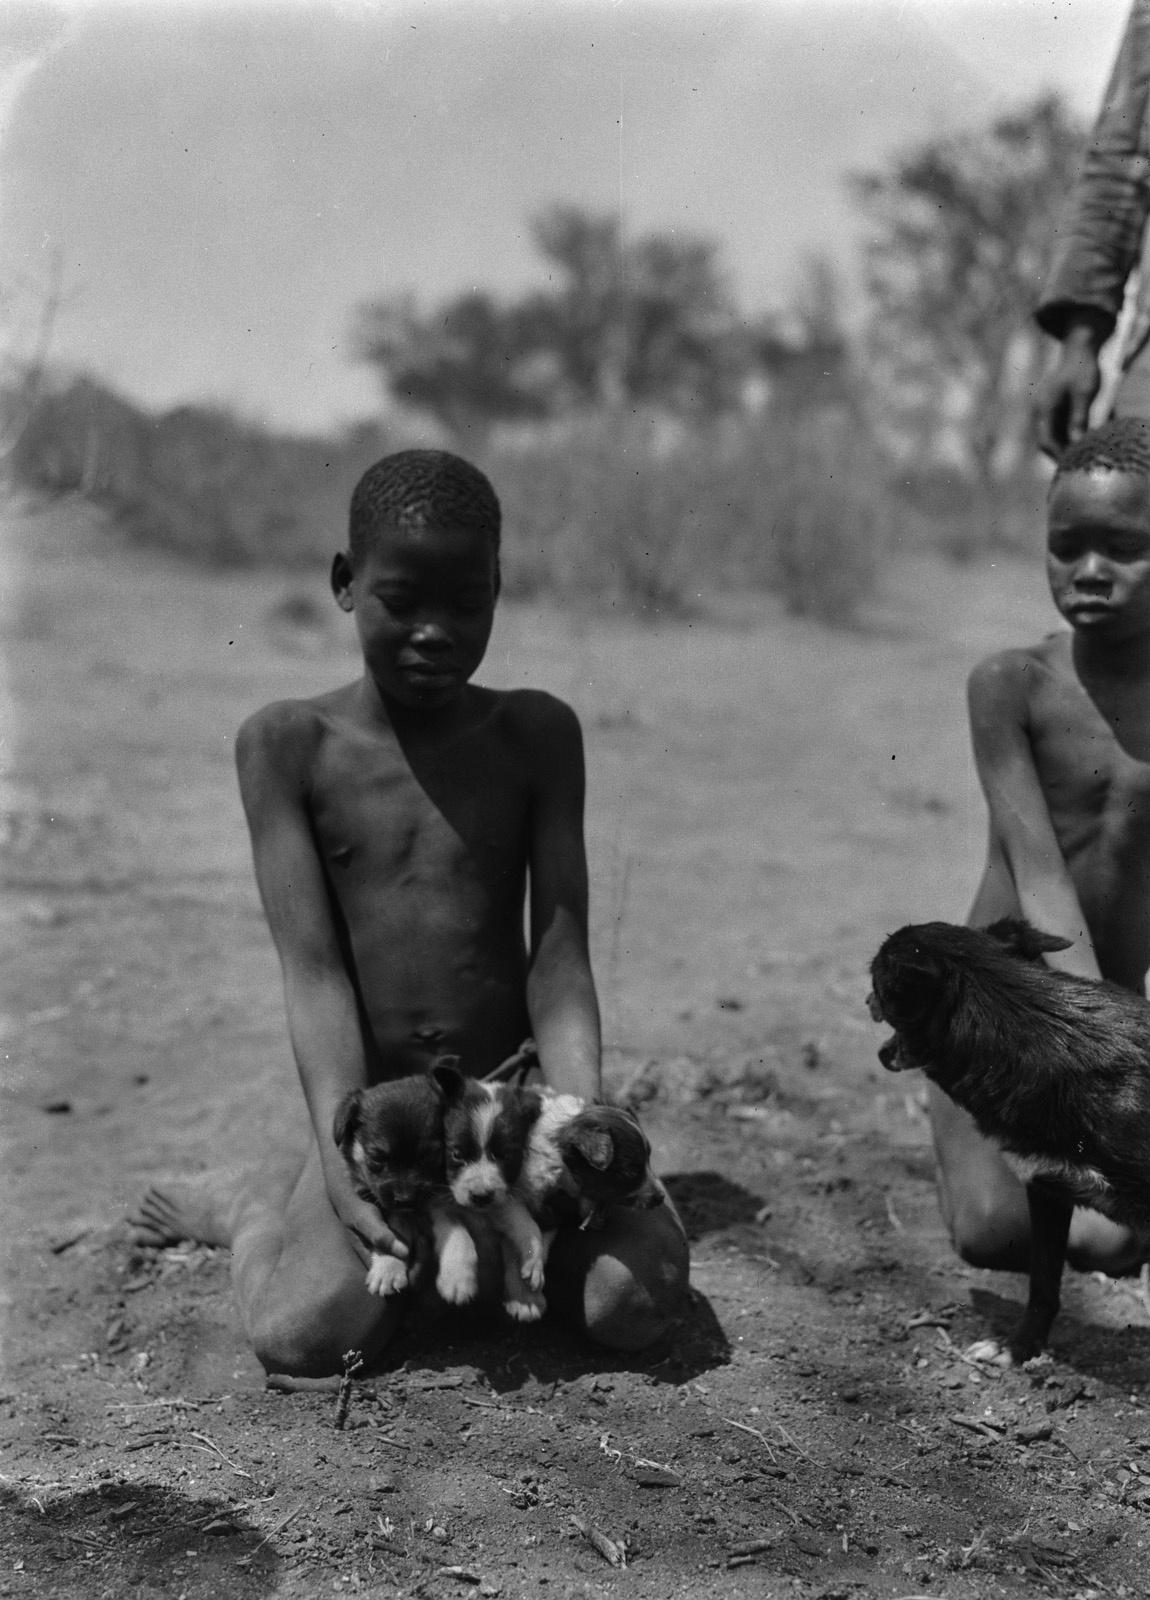 Бечуаналенд. Мальчик с щенком